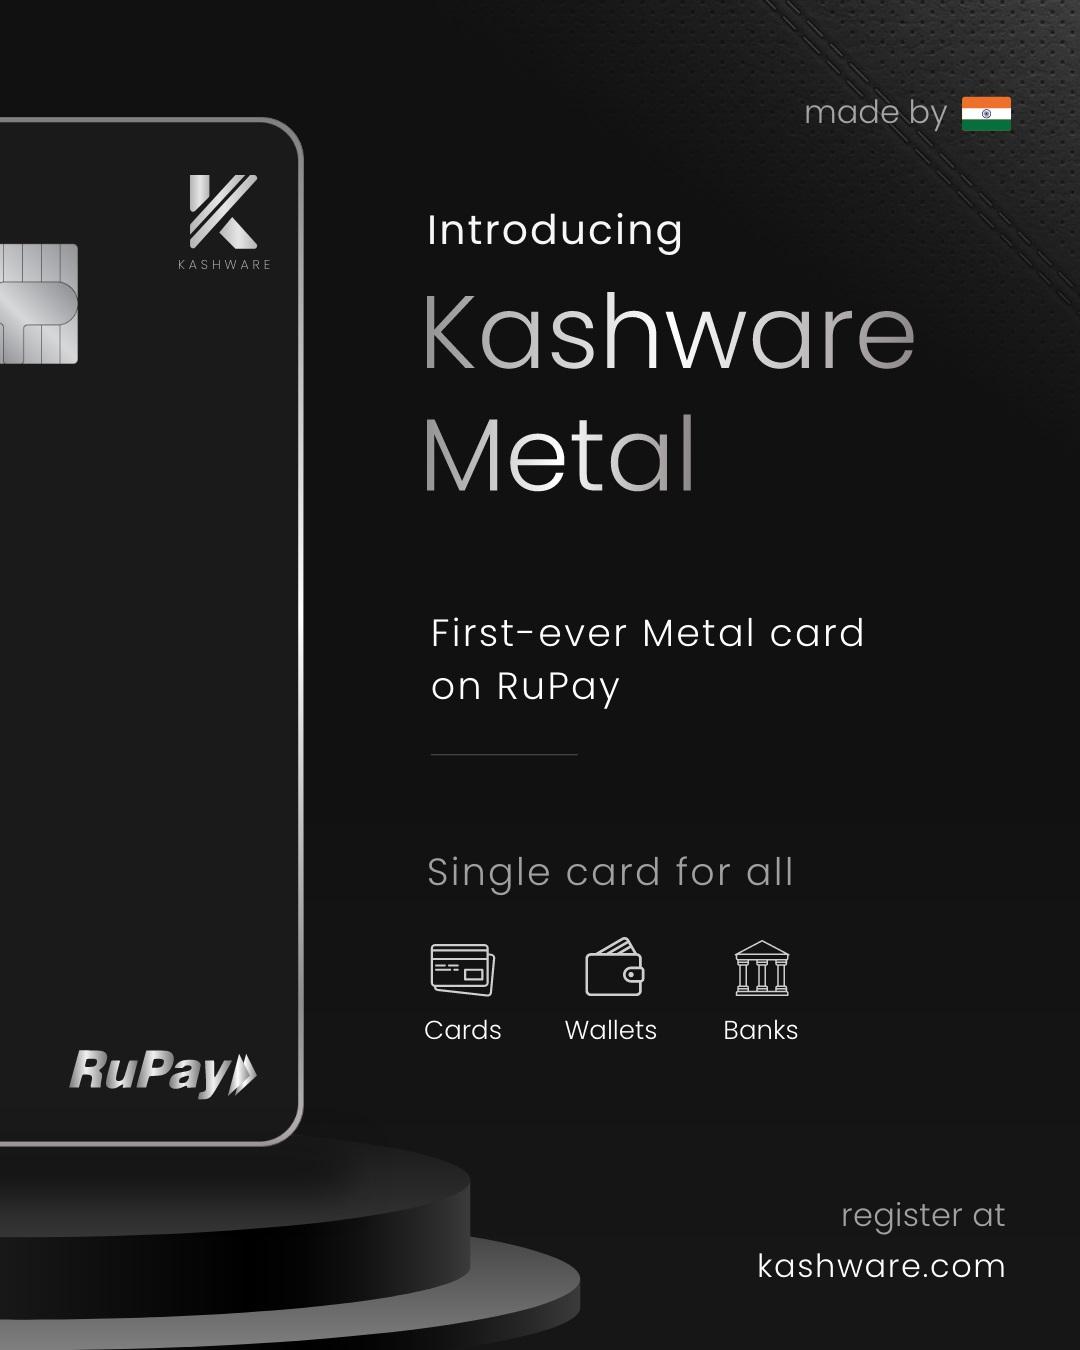 Introducing Kashware Metal